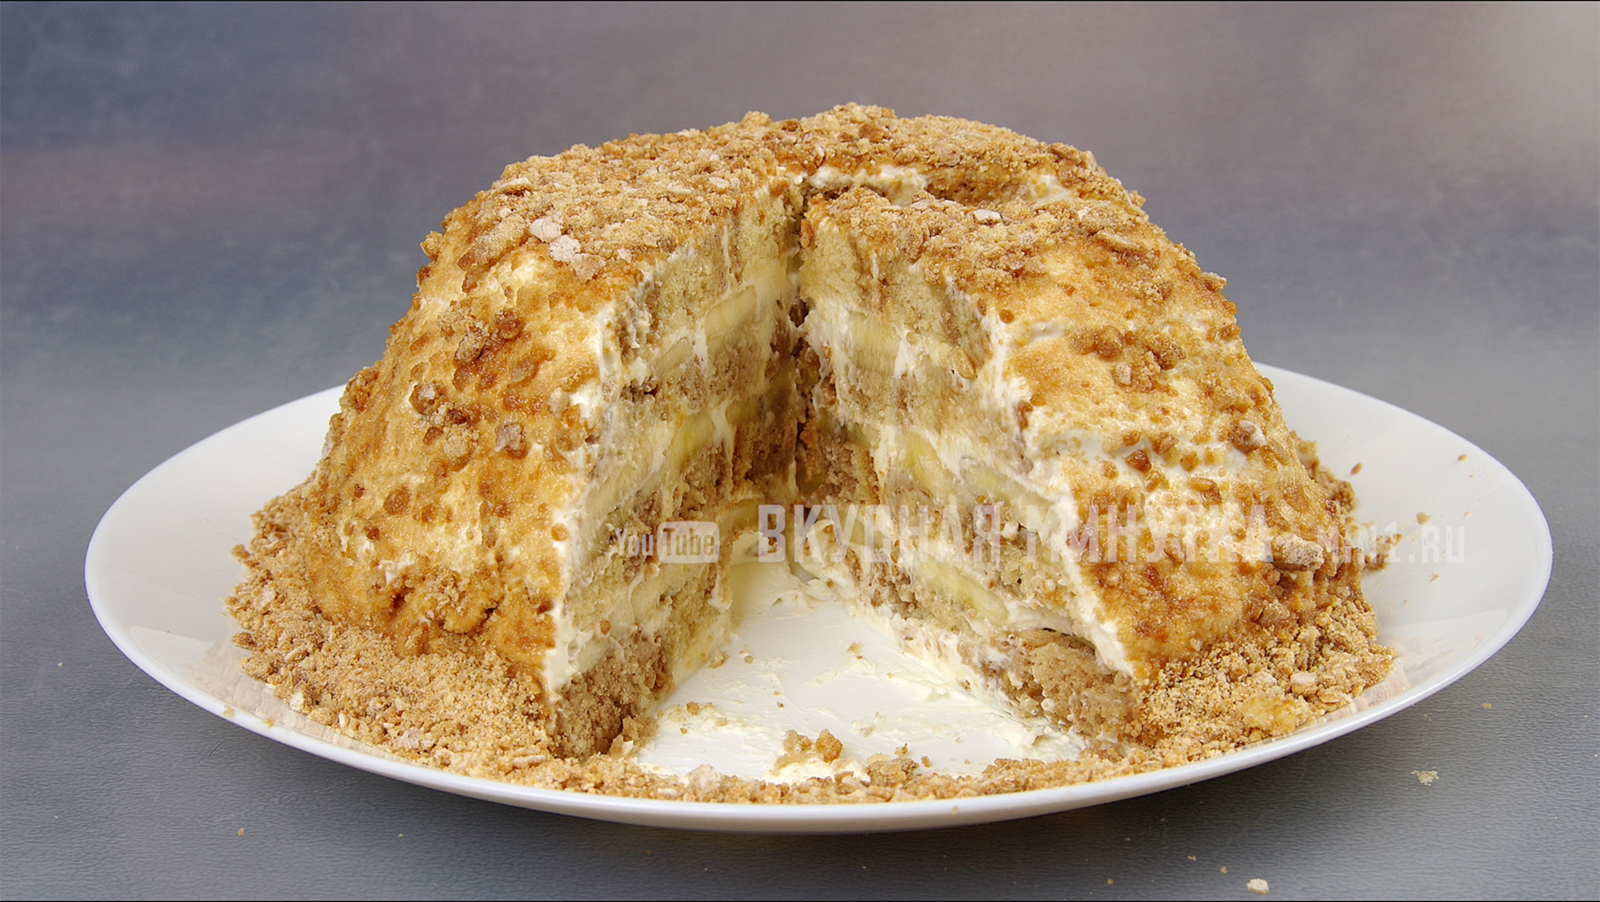 Торт БЕЗ ВЫПЕЧКИ за 10 минут и всего из трех ингредиентов!